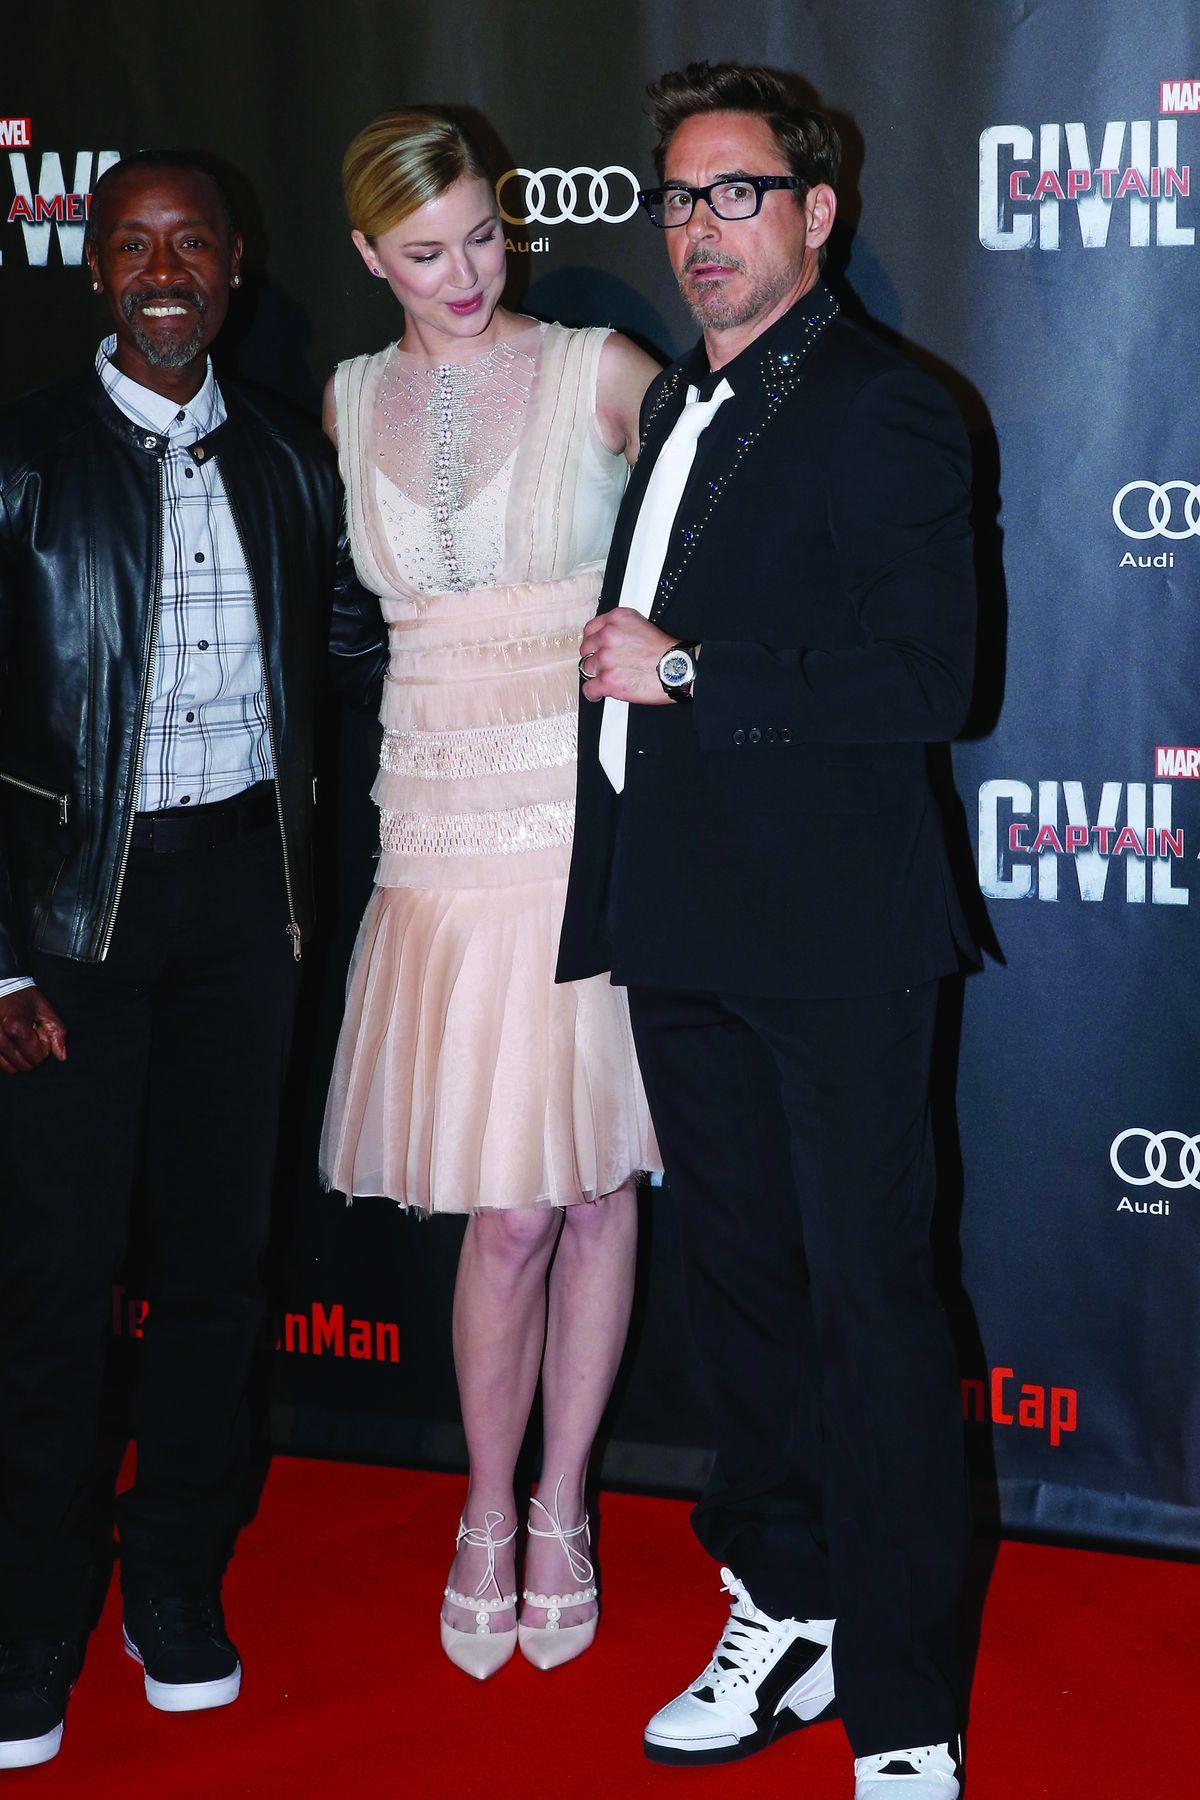 Don Cheadle, Emily VanCamp, Robert Downey Jr.